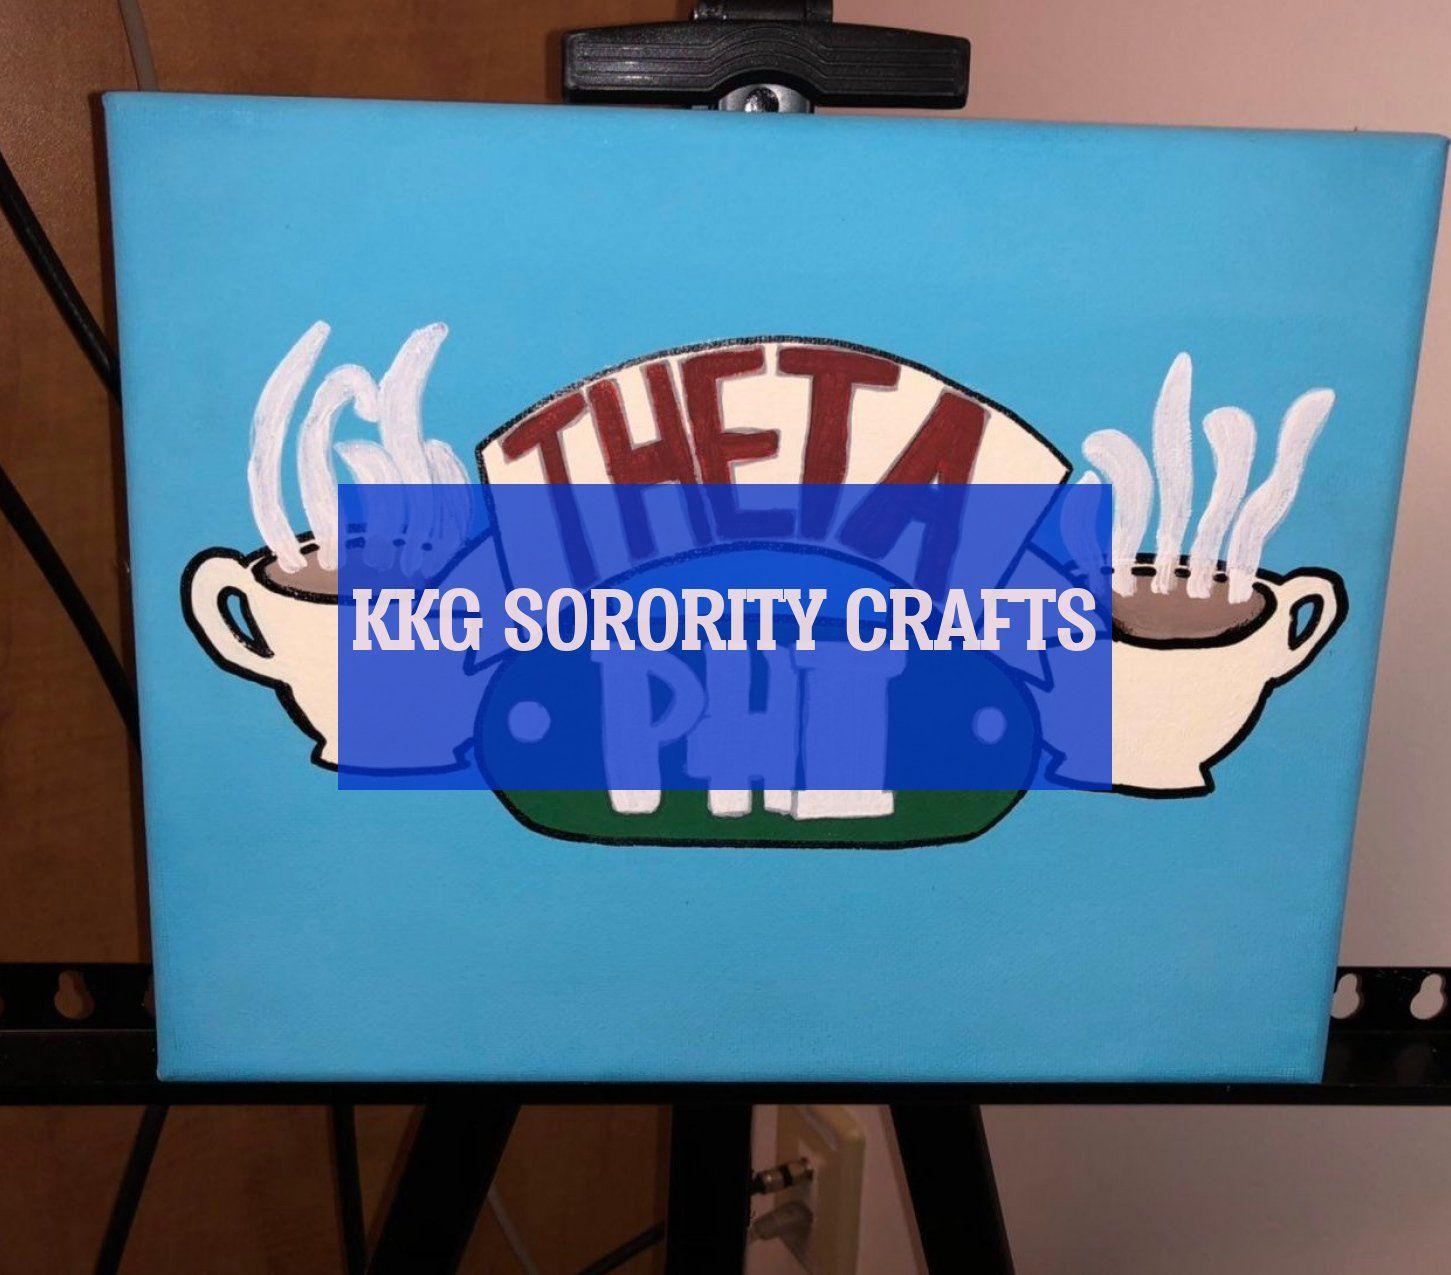 Kkg sorority crafts